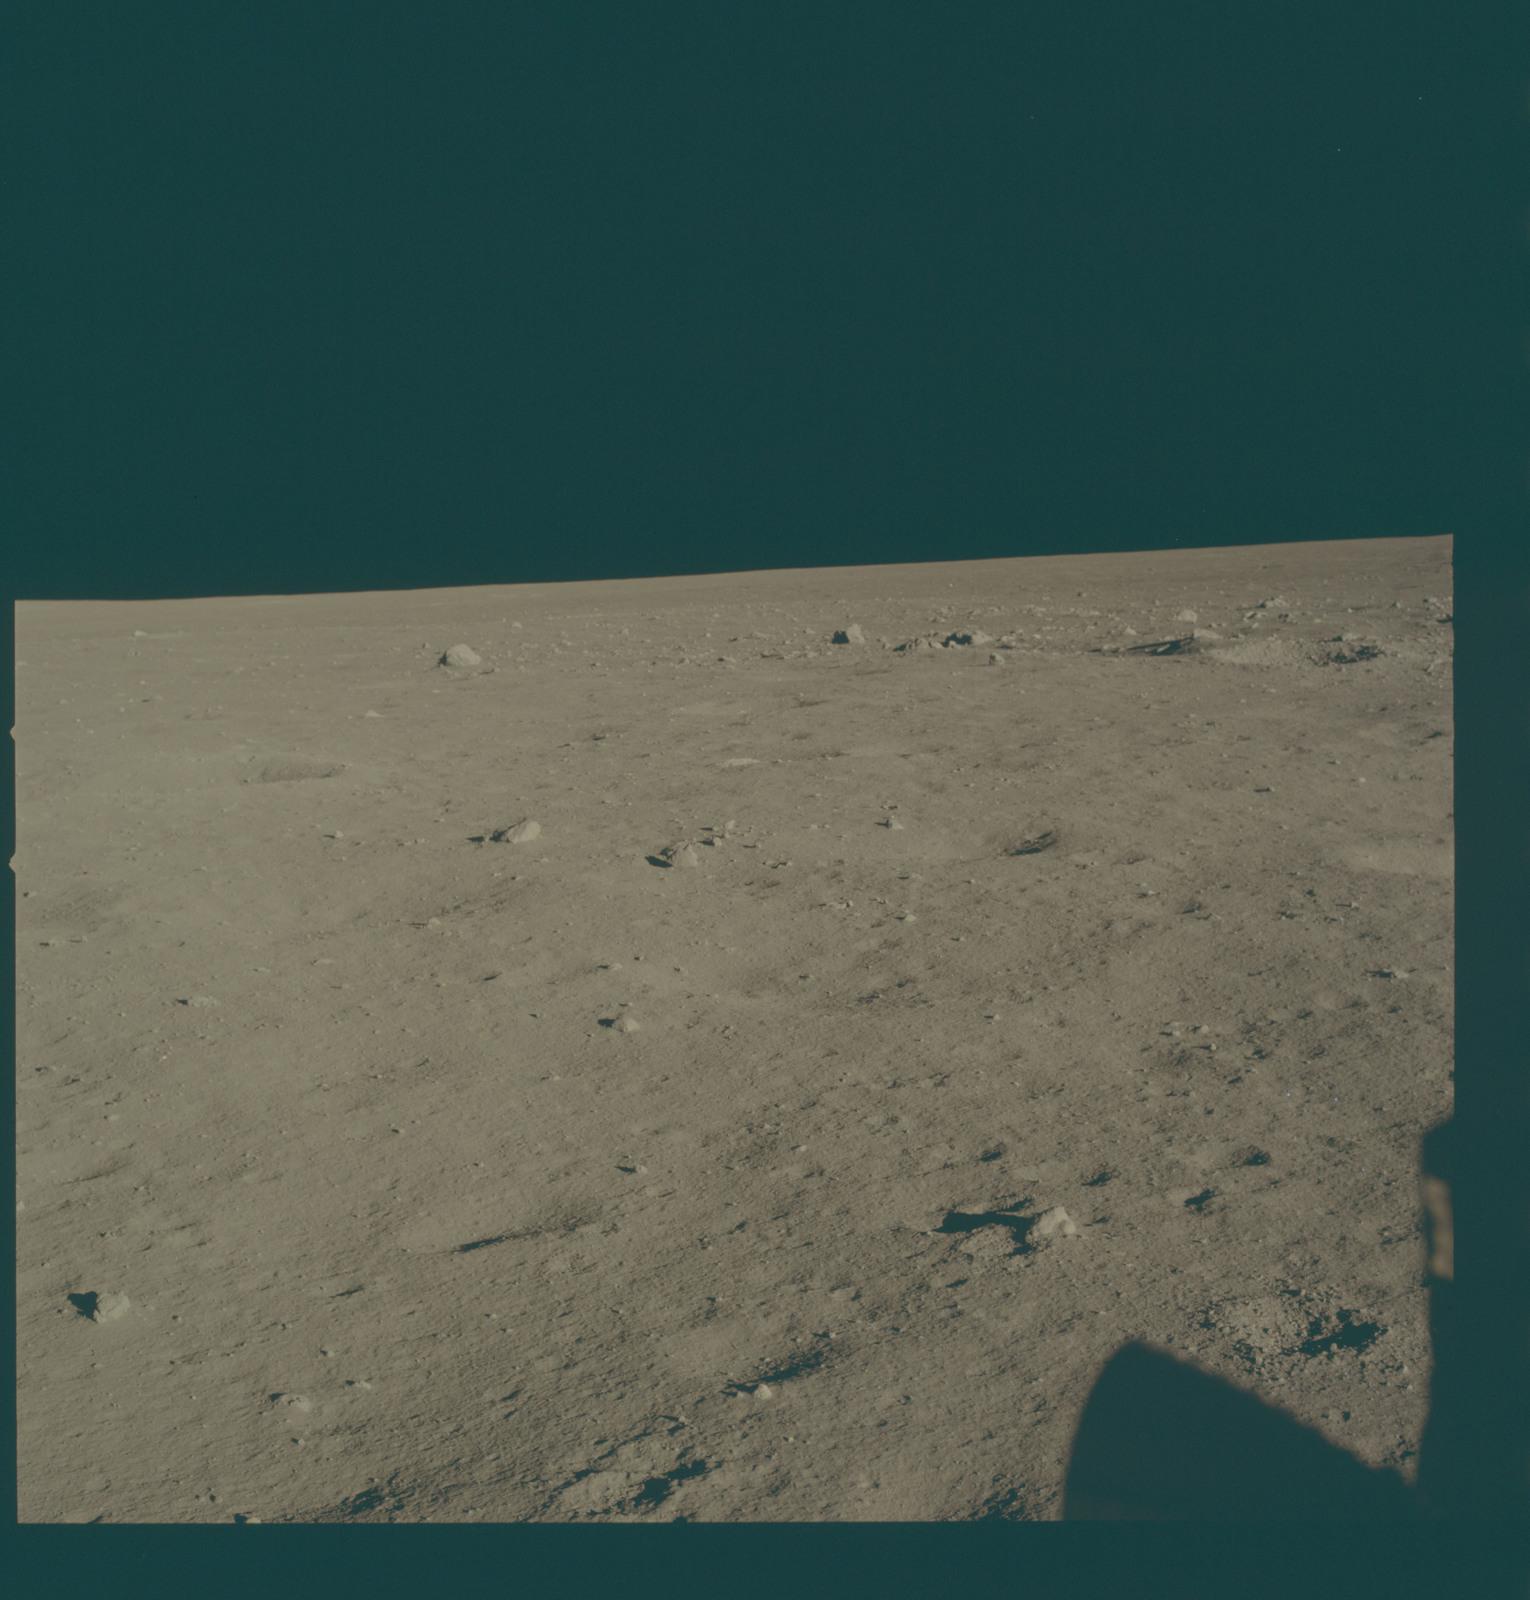 AS11-37-5457 - Apollo 11 - Apollo 11 Mission image - Lunar horizon from Tranquility Base